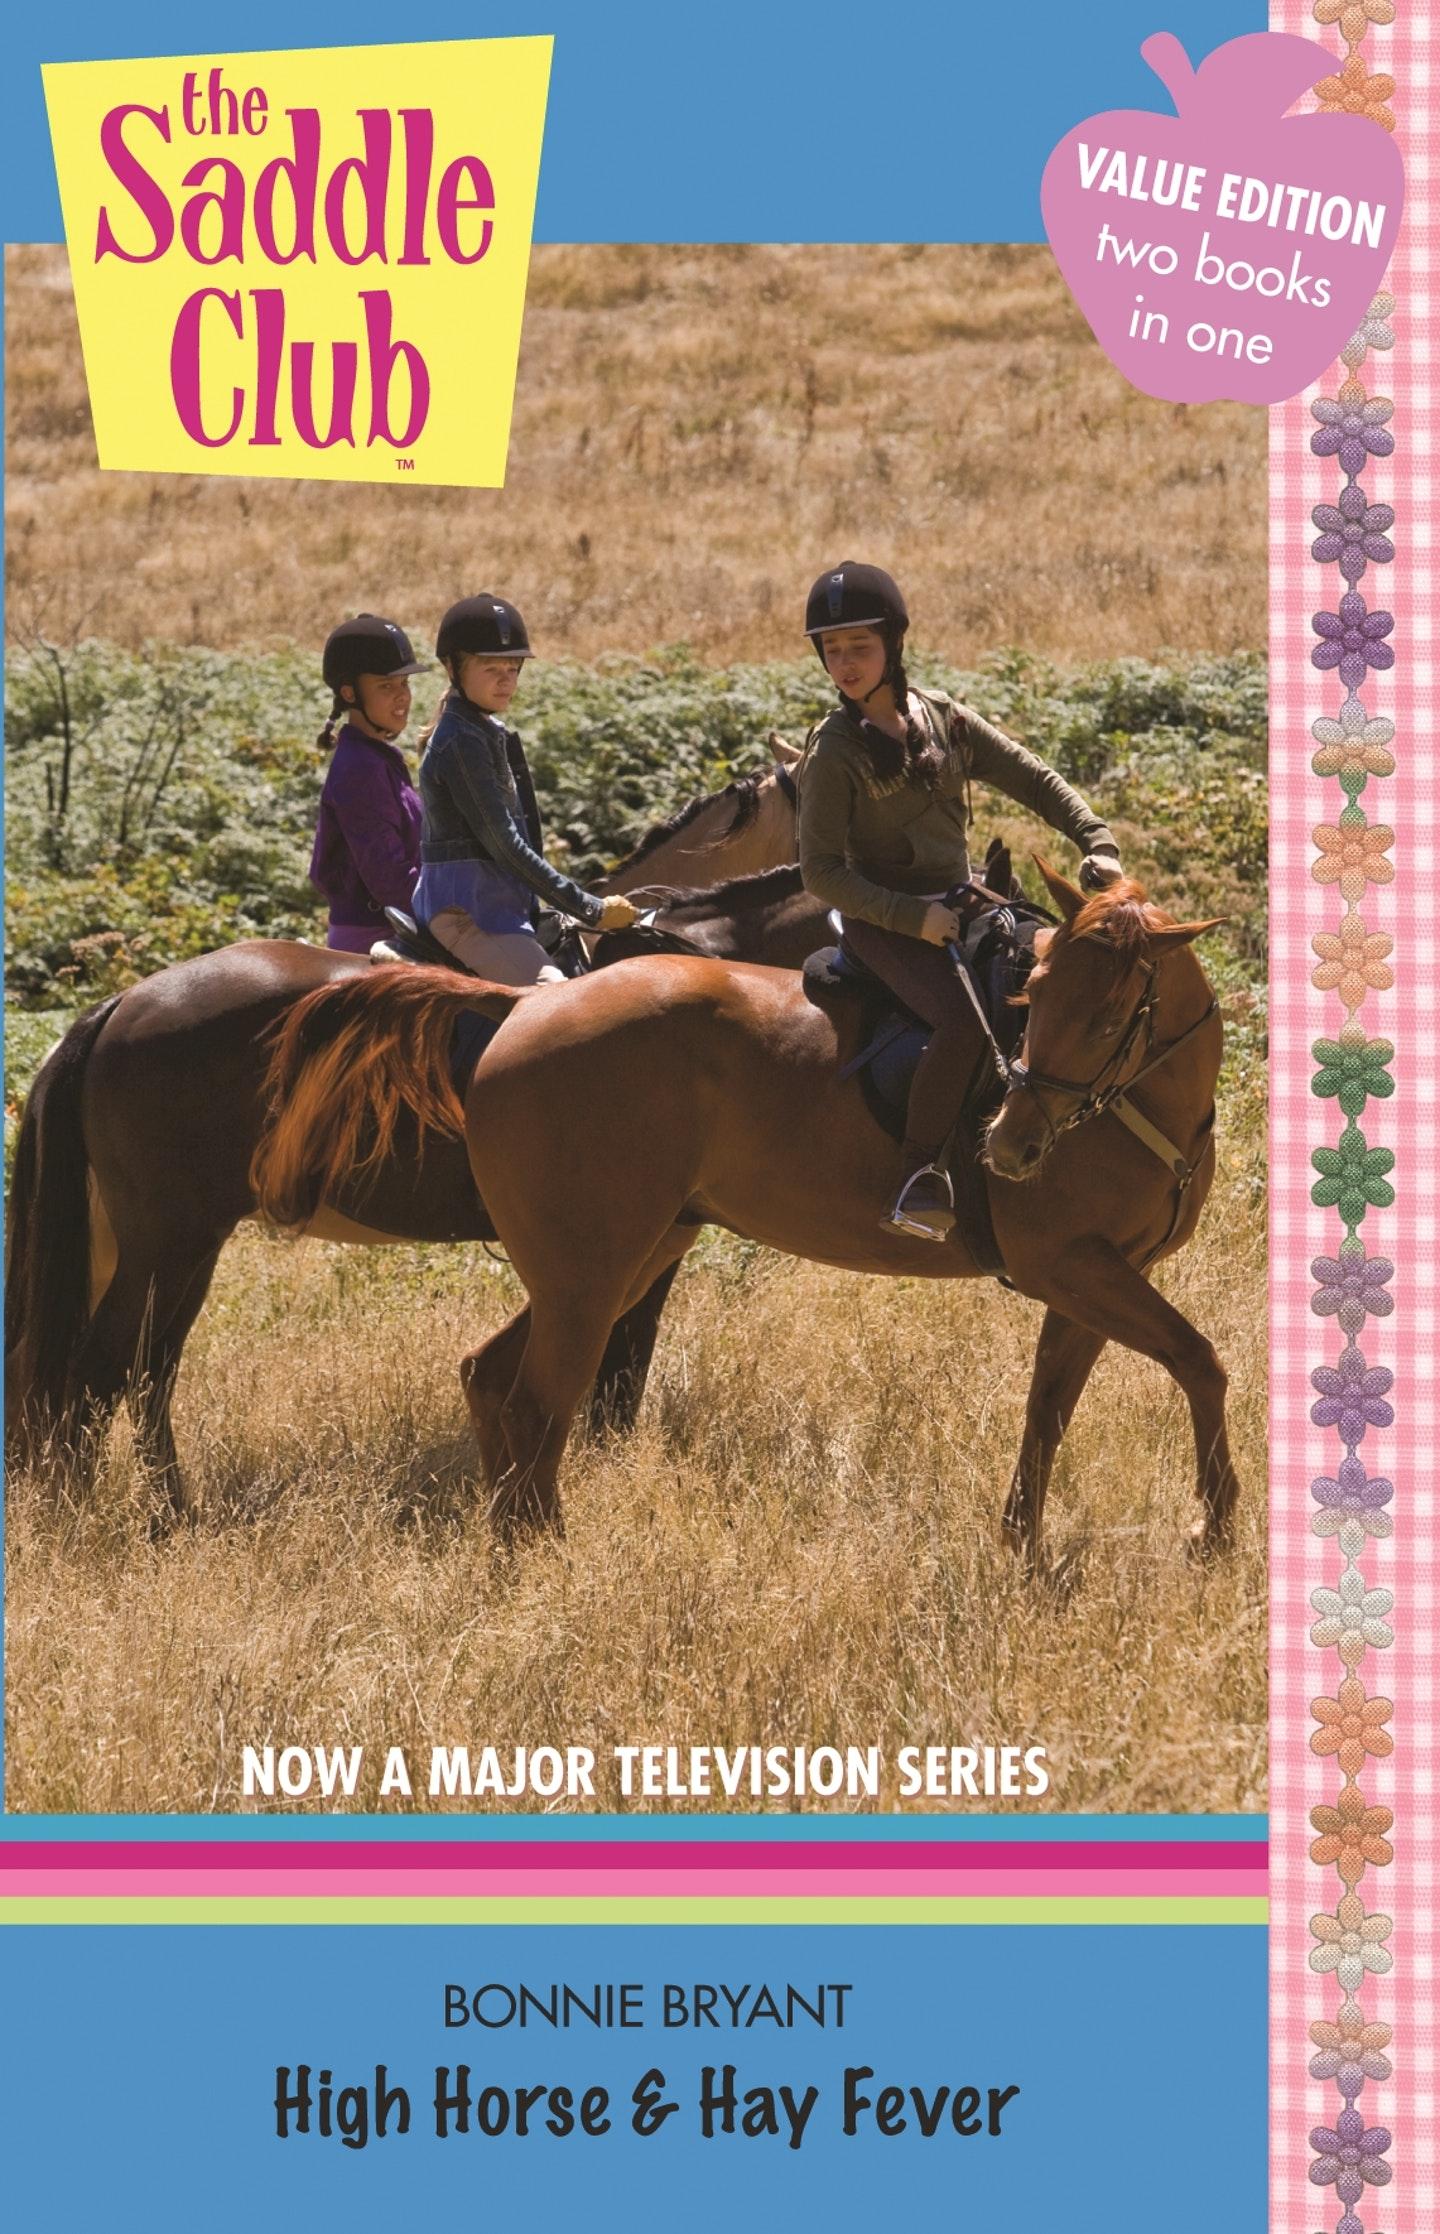 Saddle Club Bindup 5: Hoof Beat/Riding Camp by Bonnie Bryant Paperback Book